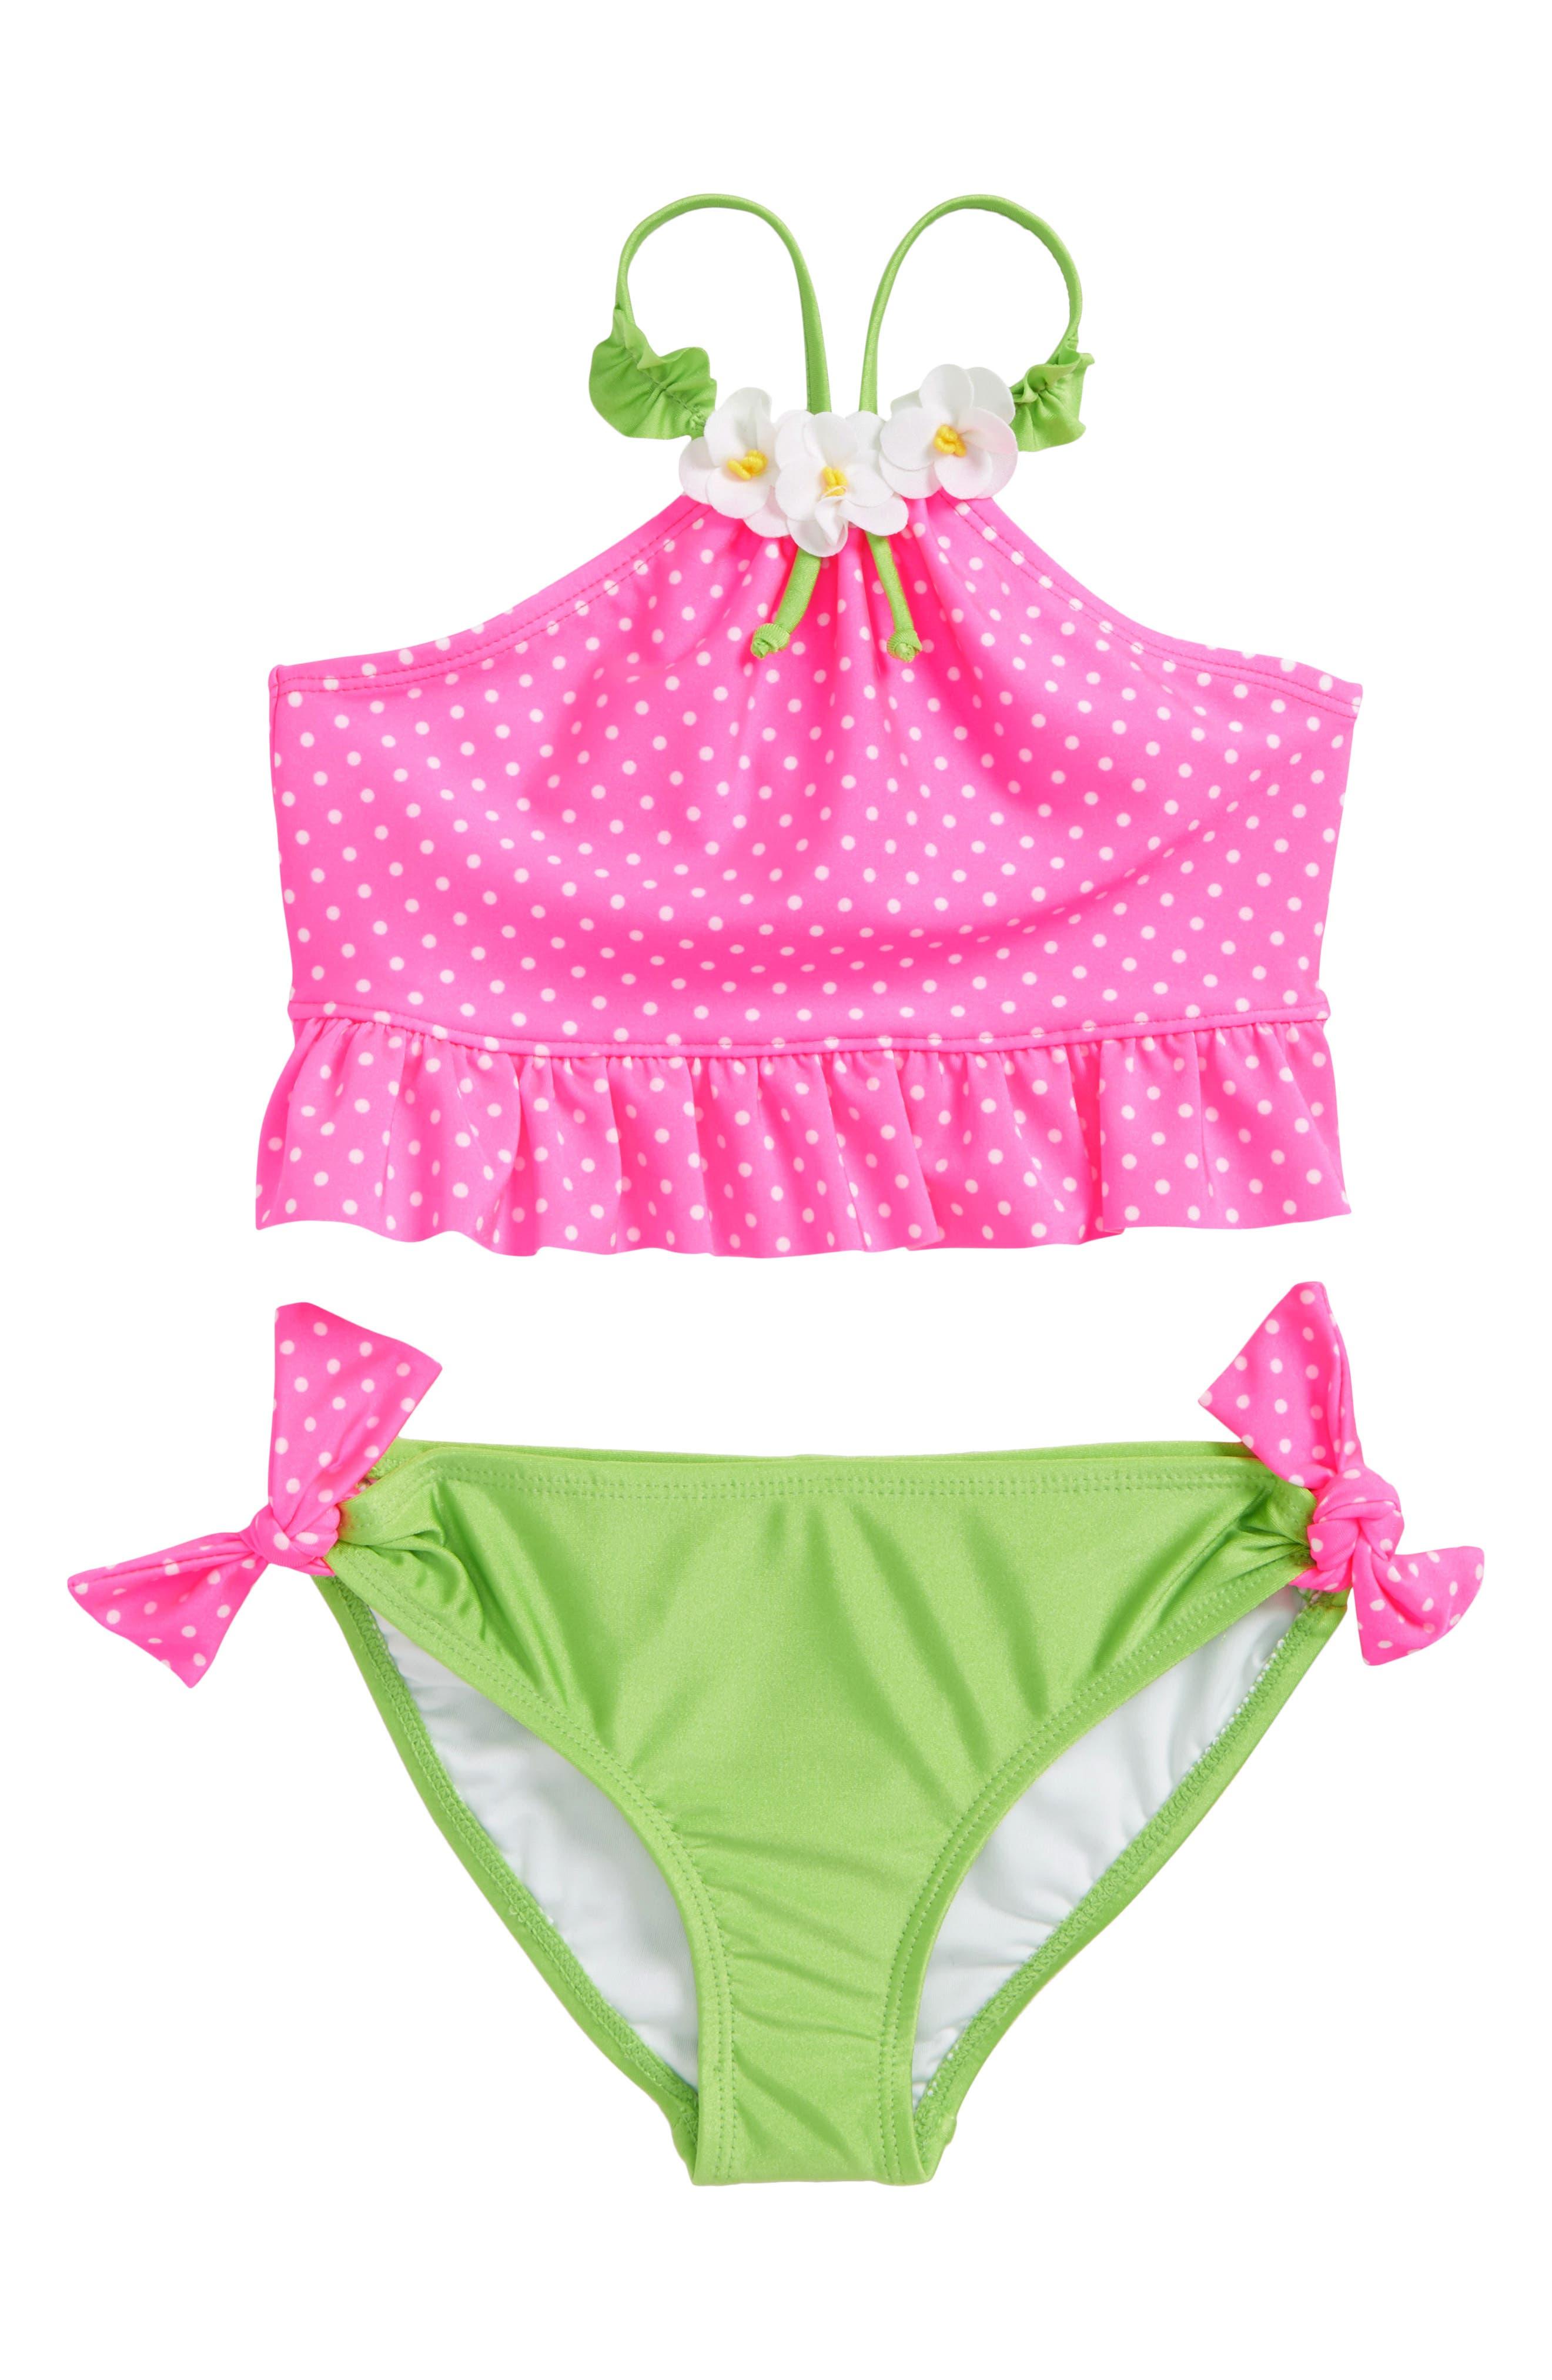 Dot Halter Two-Piece Swimsuit,                             Main thumbnail 1, color,                             Pink Dot